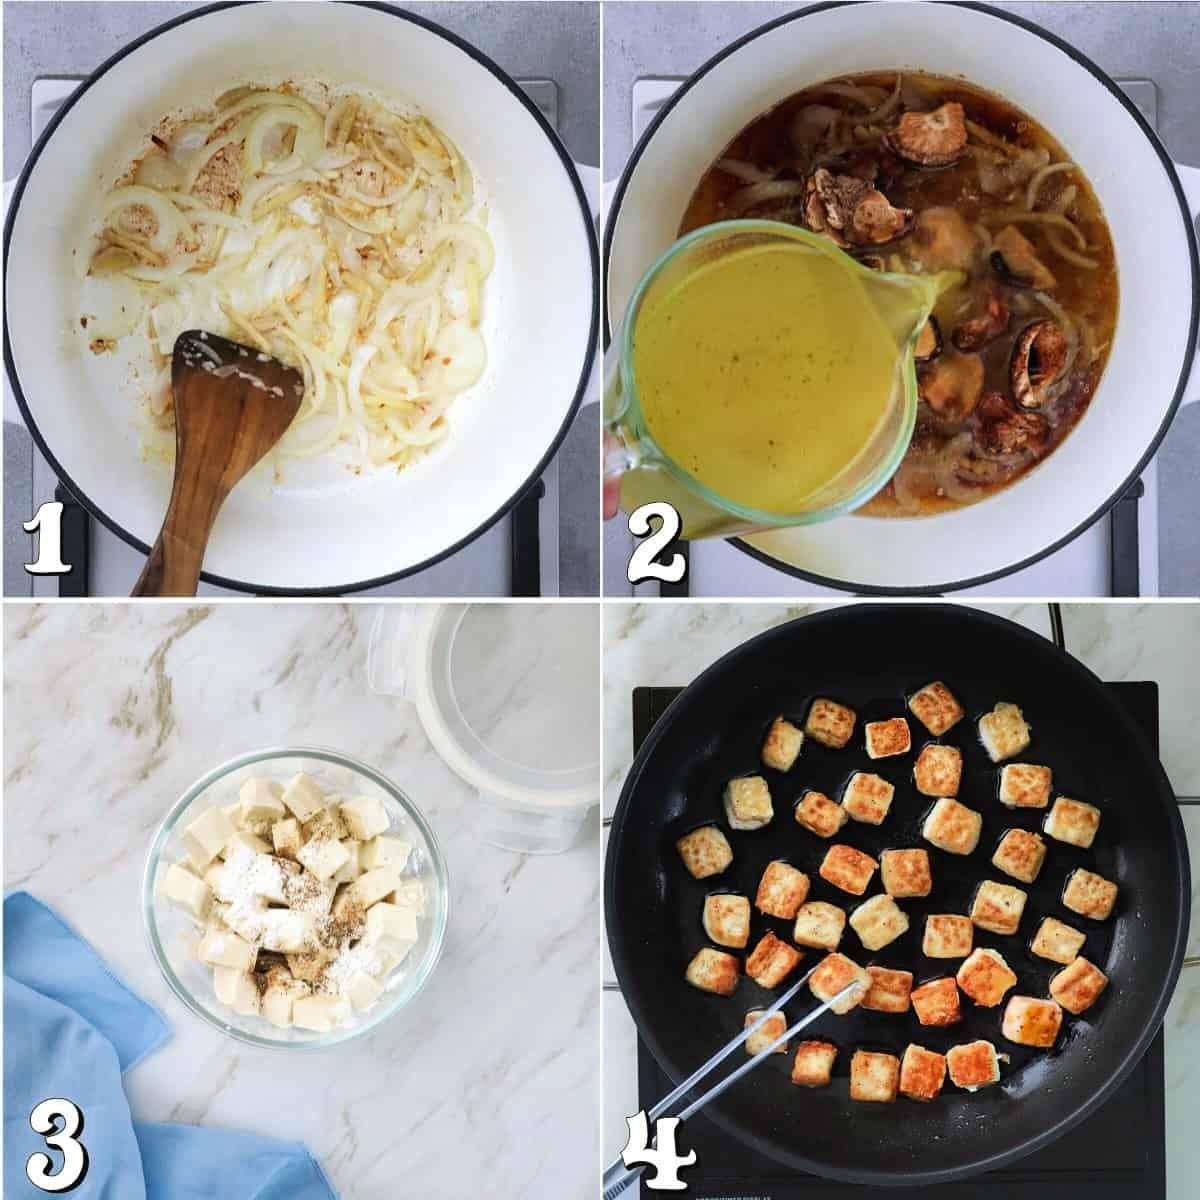 4 process photos of preparing broth and crispy tofu.